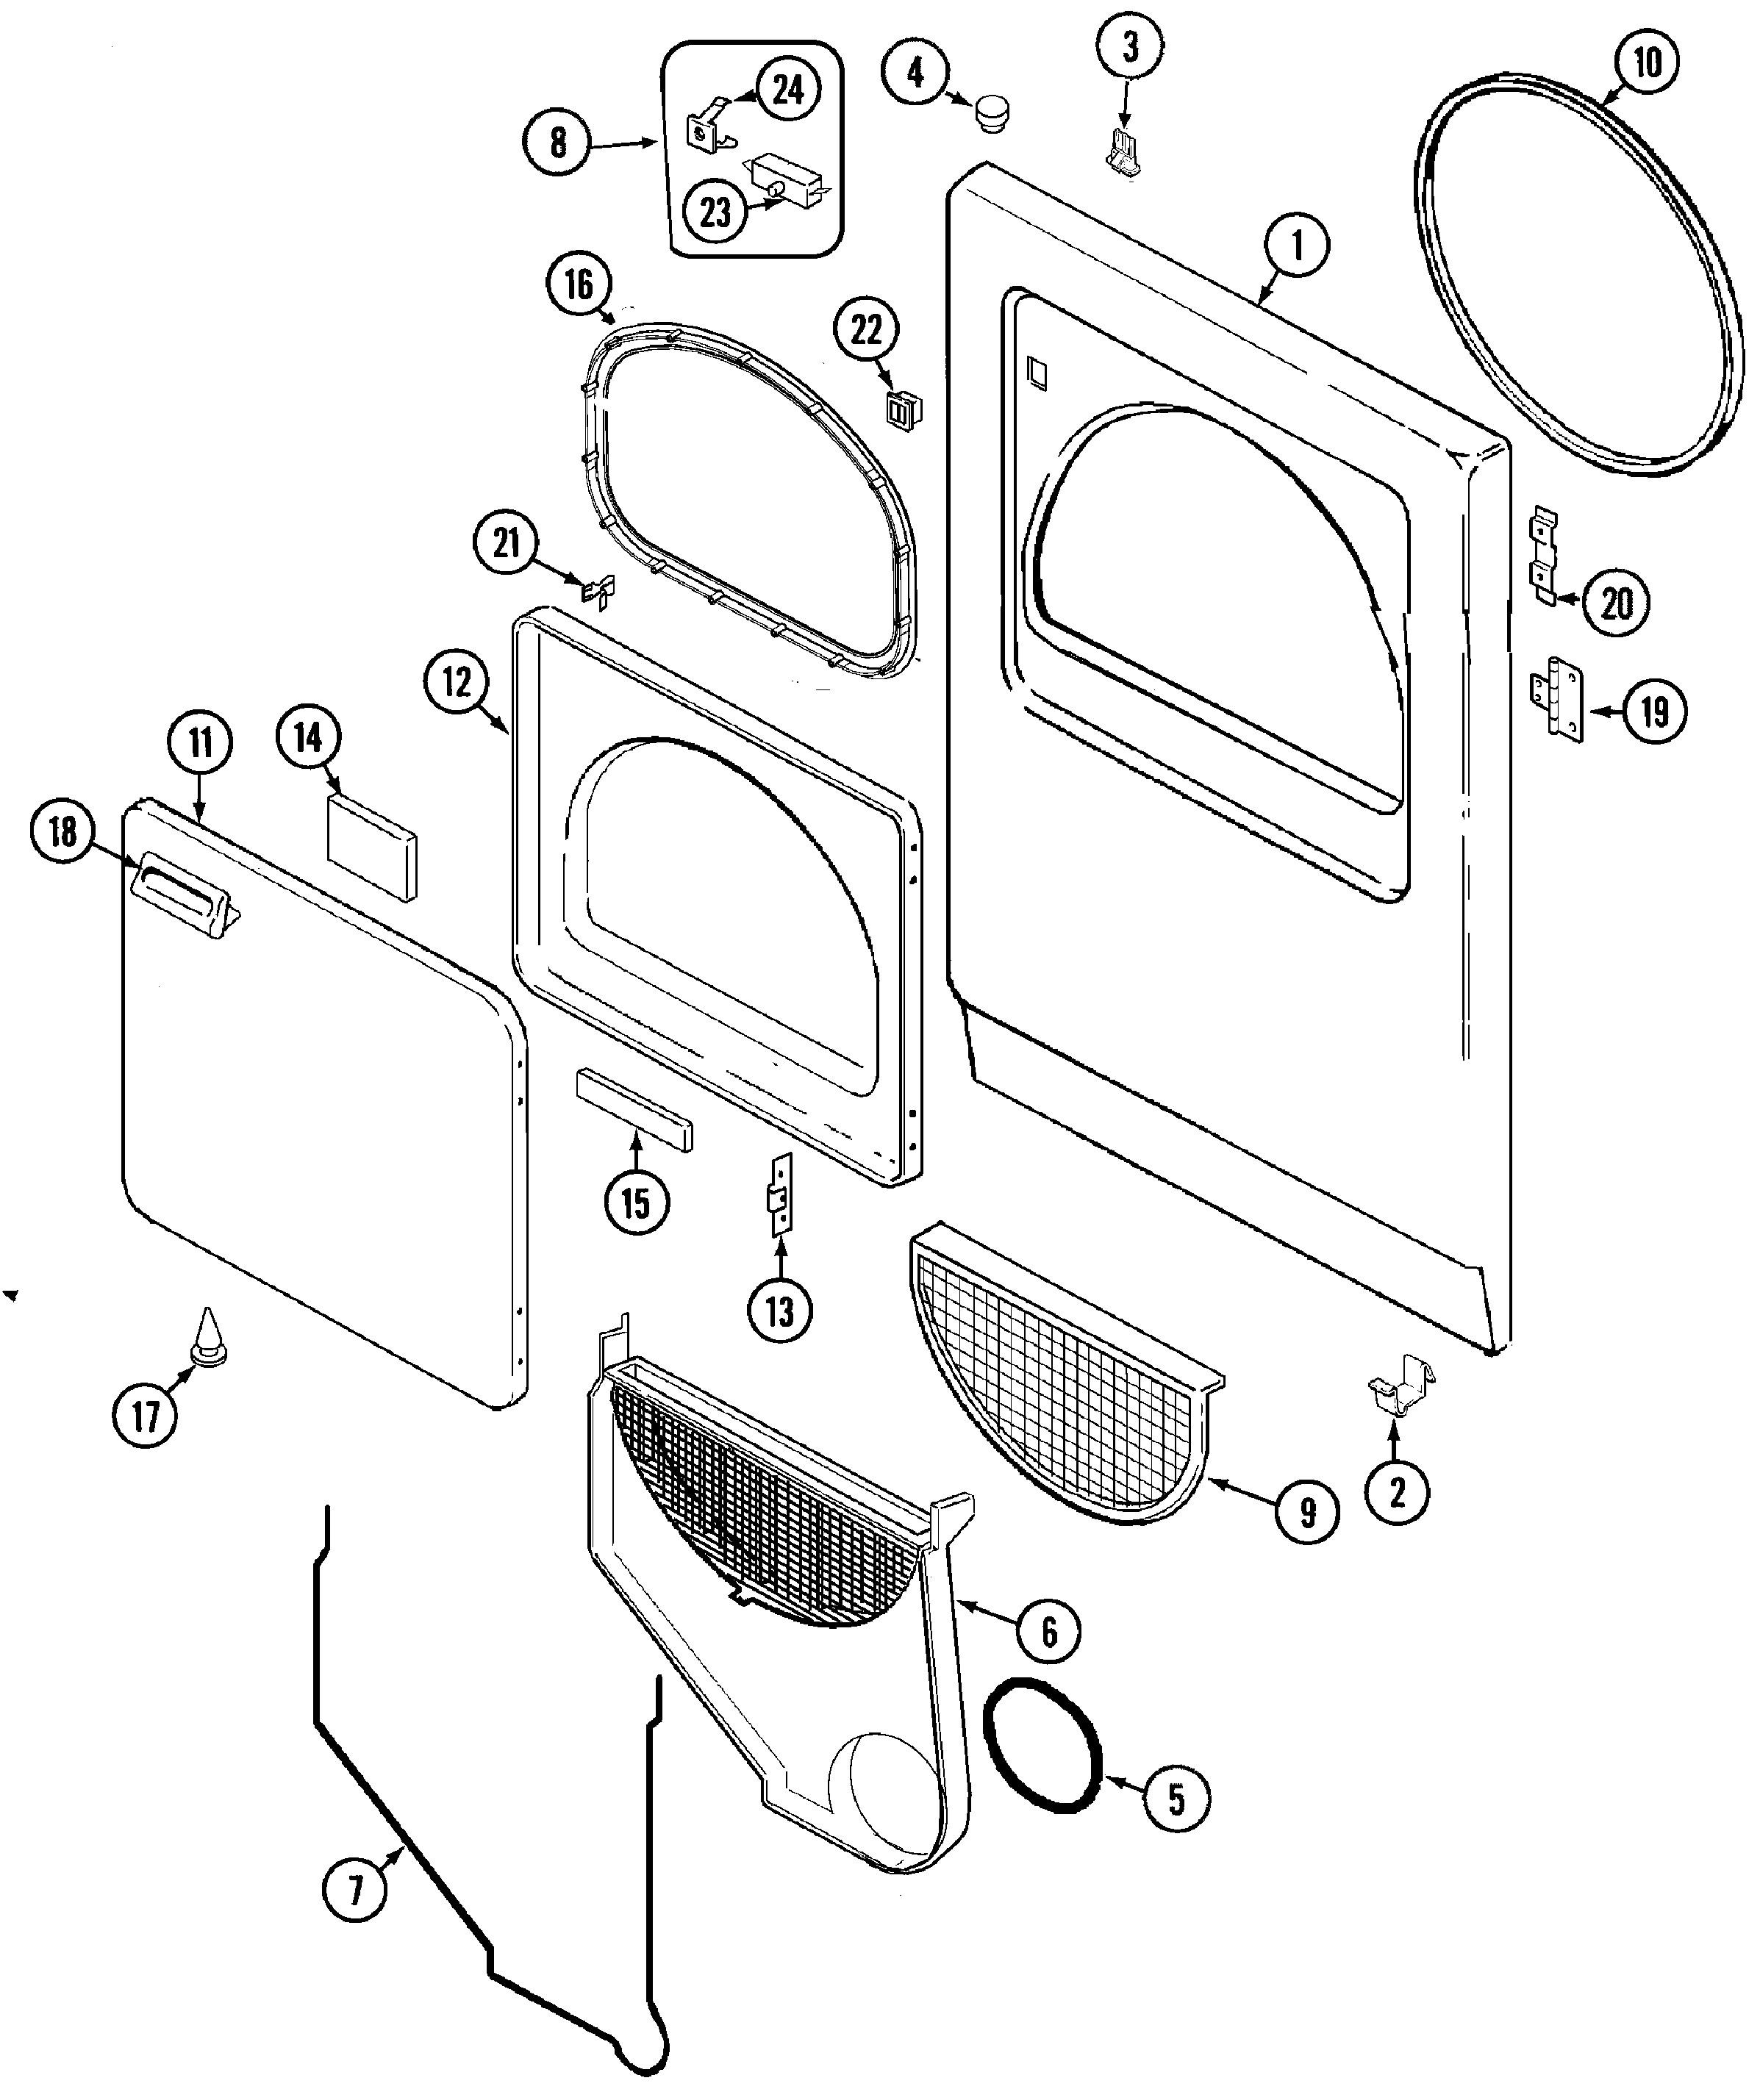 Admiral Dryer Parts Diagram Magic Chef Magic Chef Laundry Parts Model Cyg3004aww Of Admiral Dryer Parts Diagram